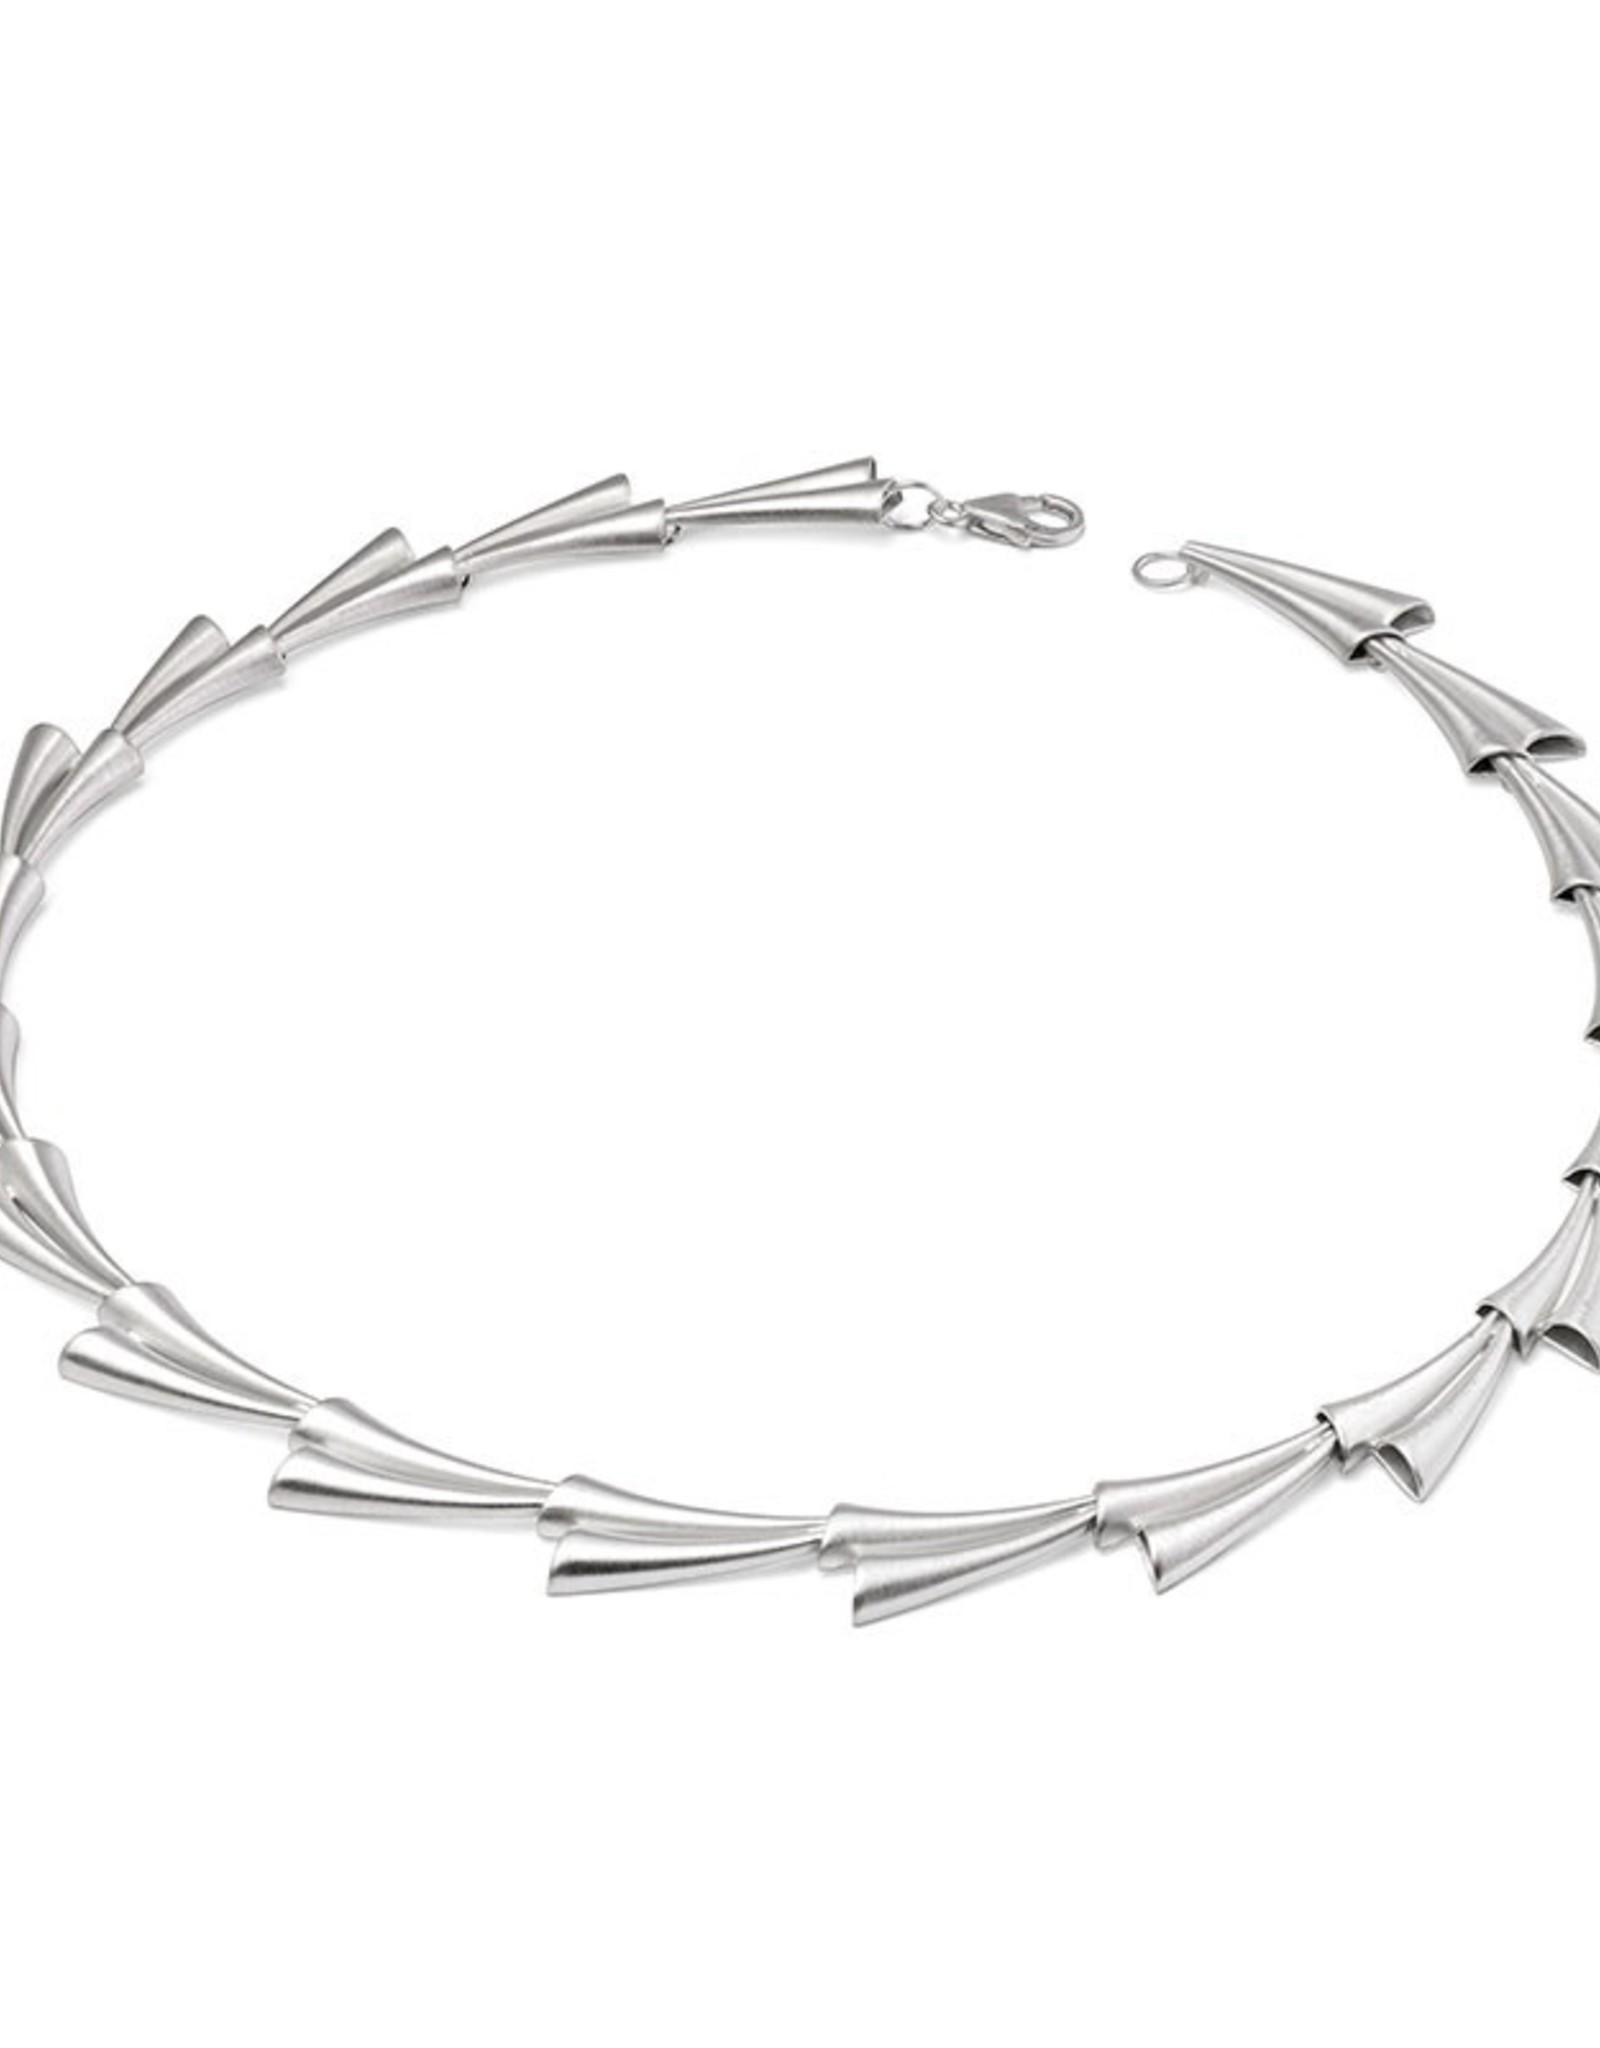 Kelim Flute Necklace